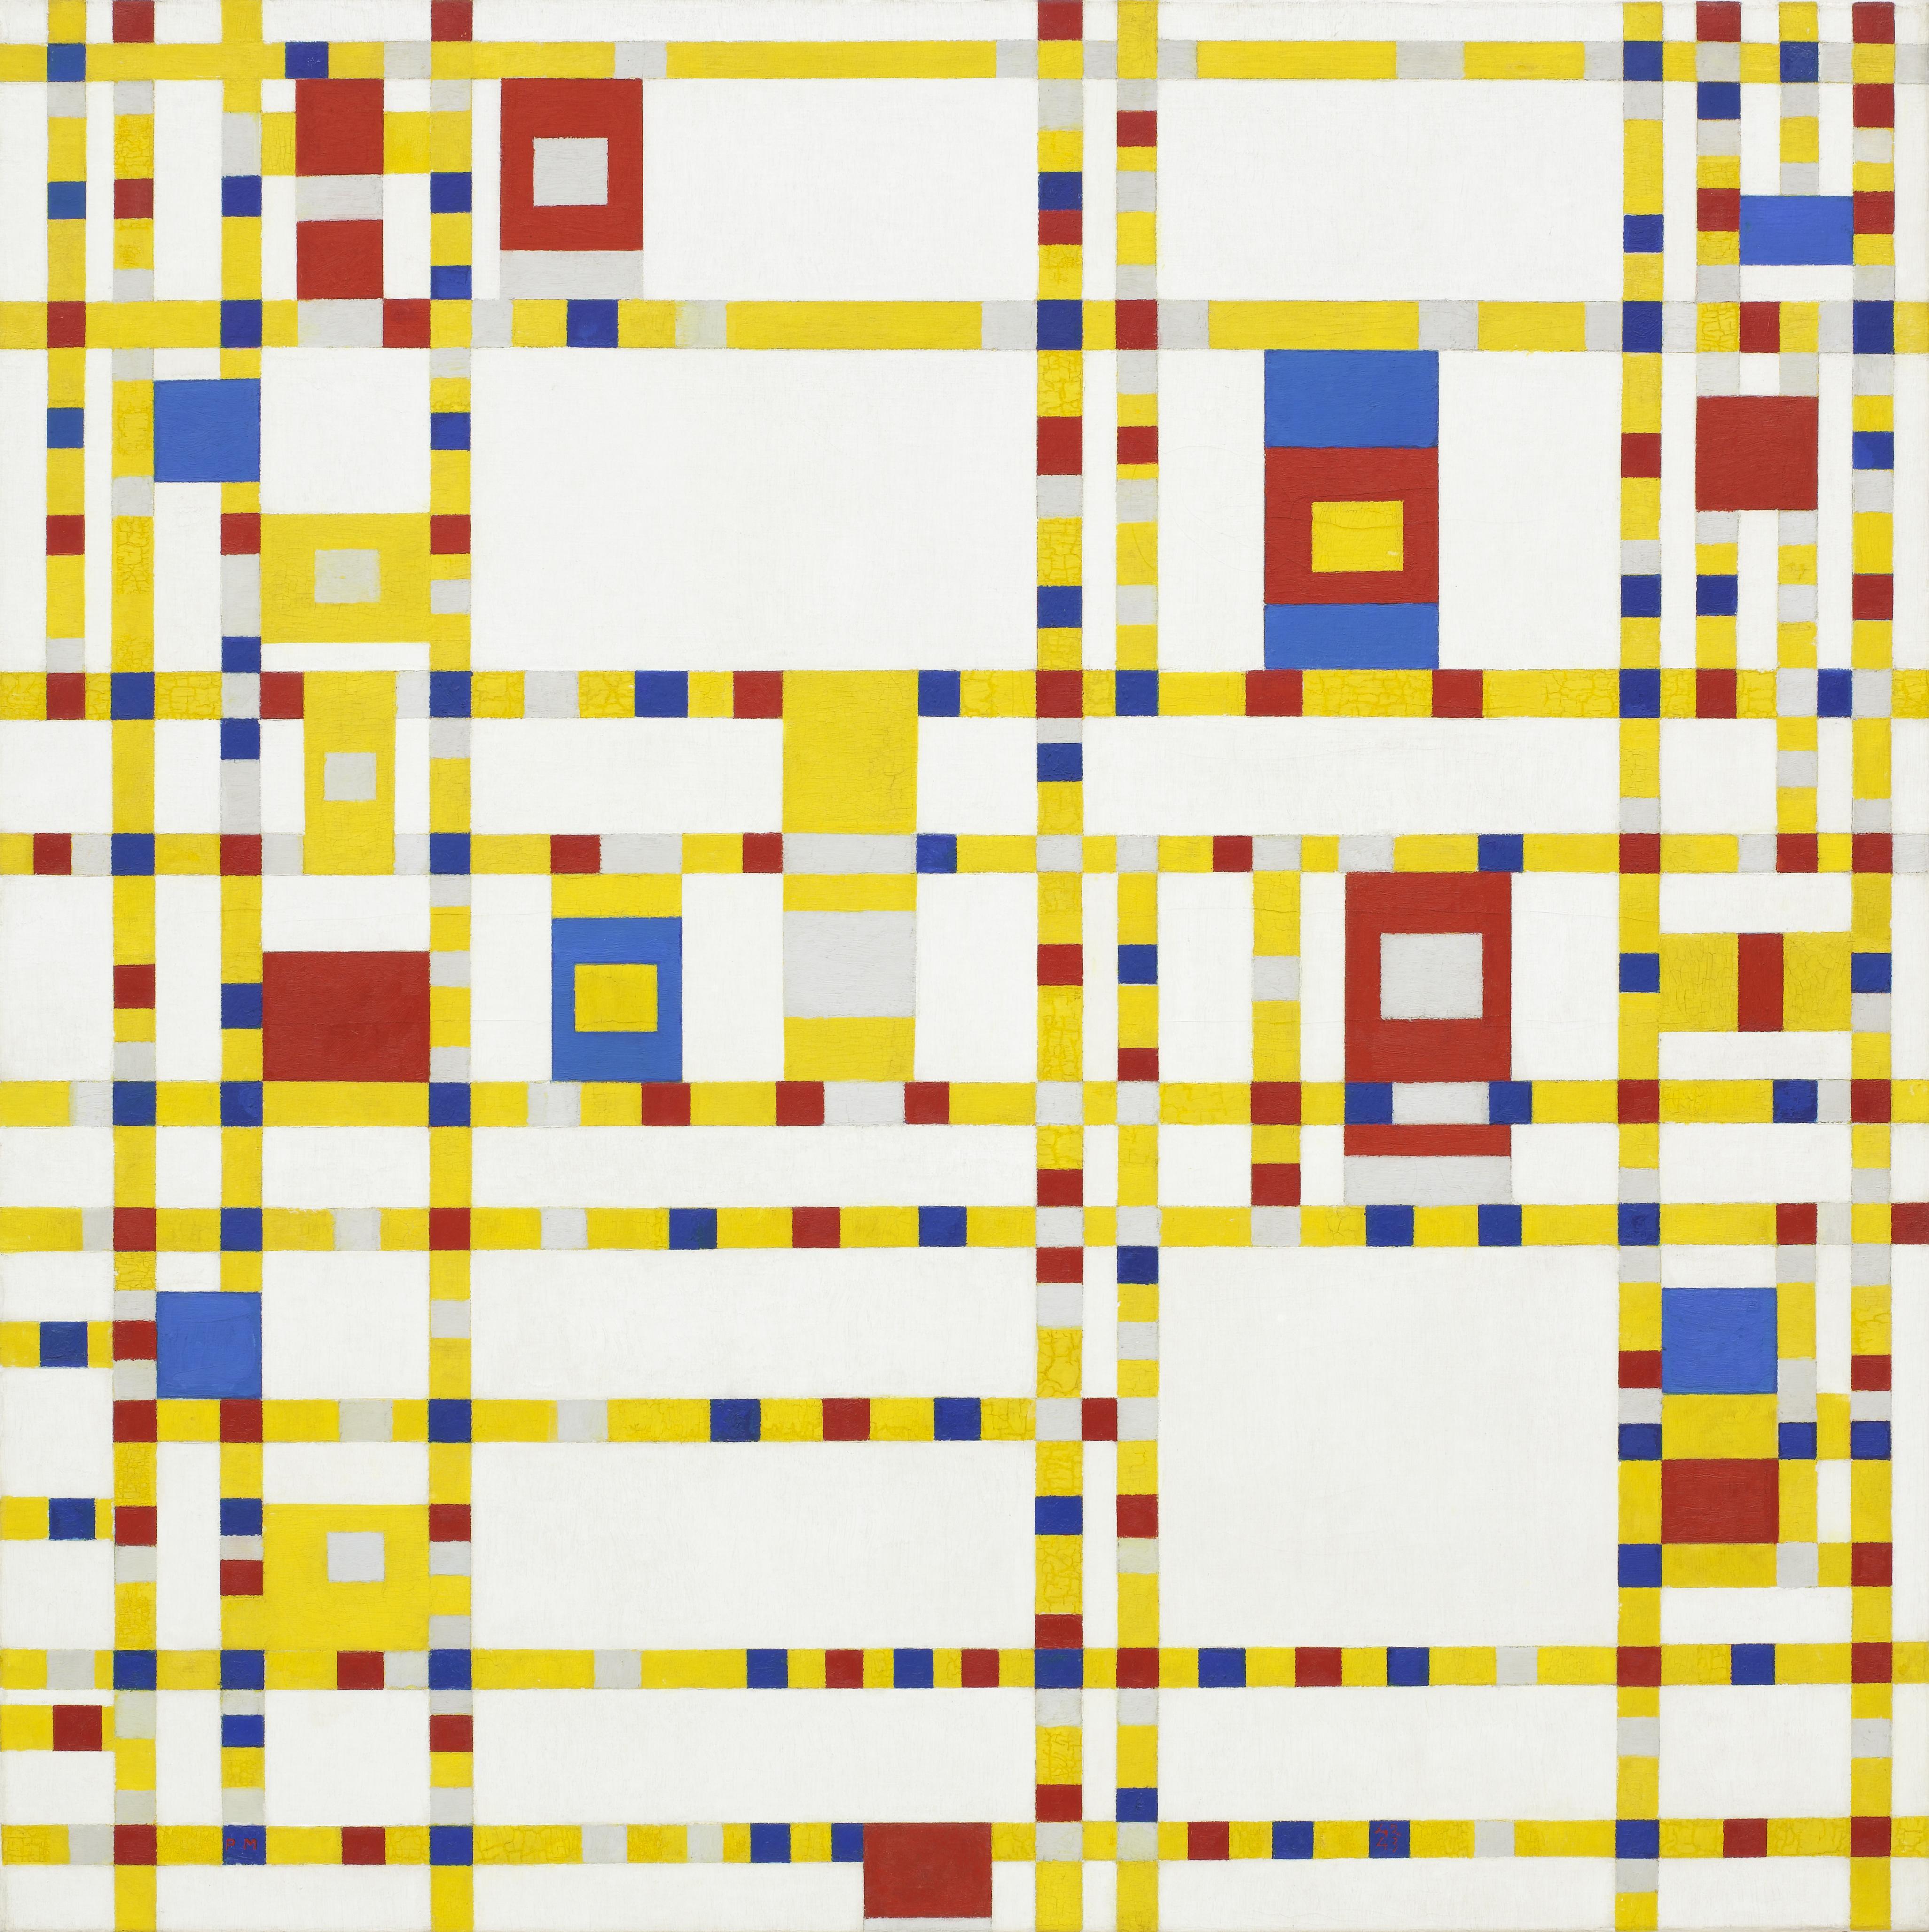 Piet Mondrian Broadway Boogie Woogie Canvas Sydney